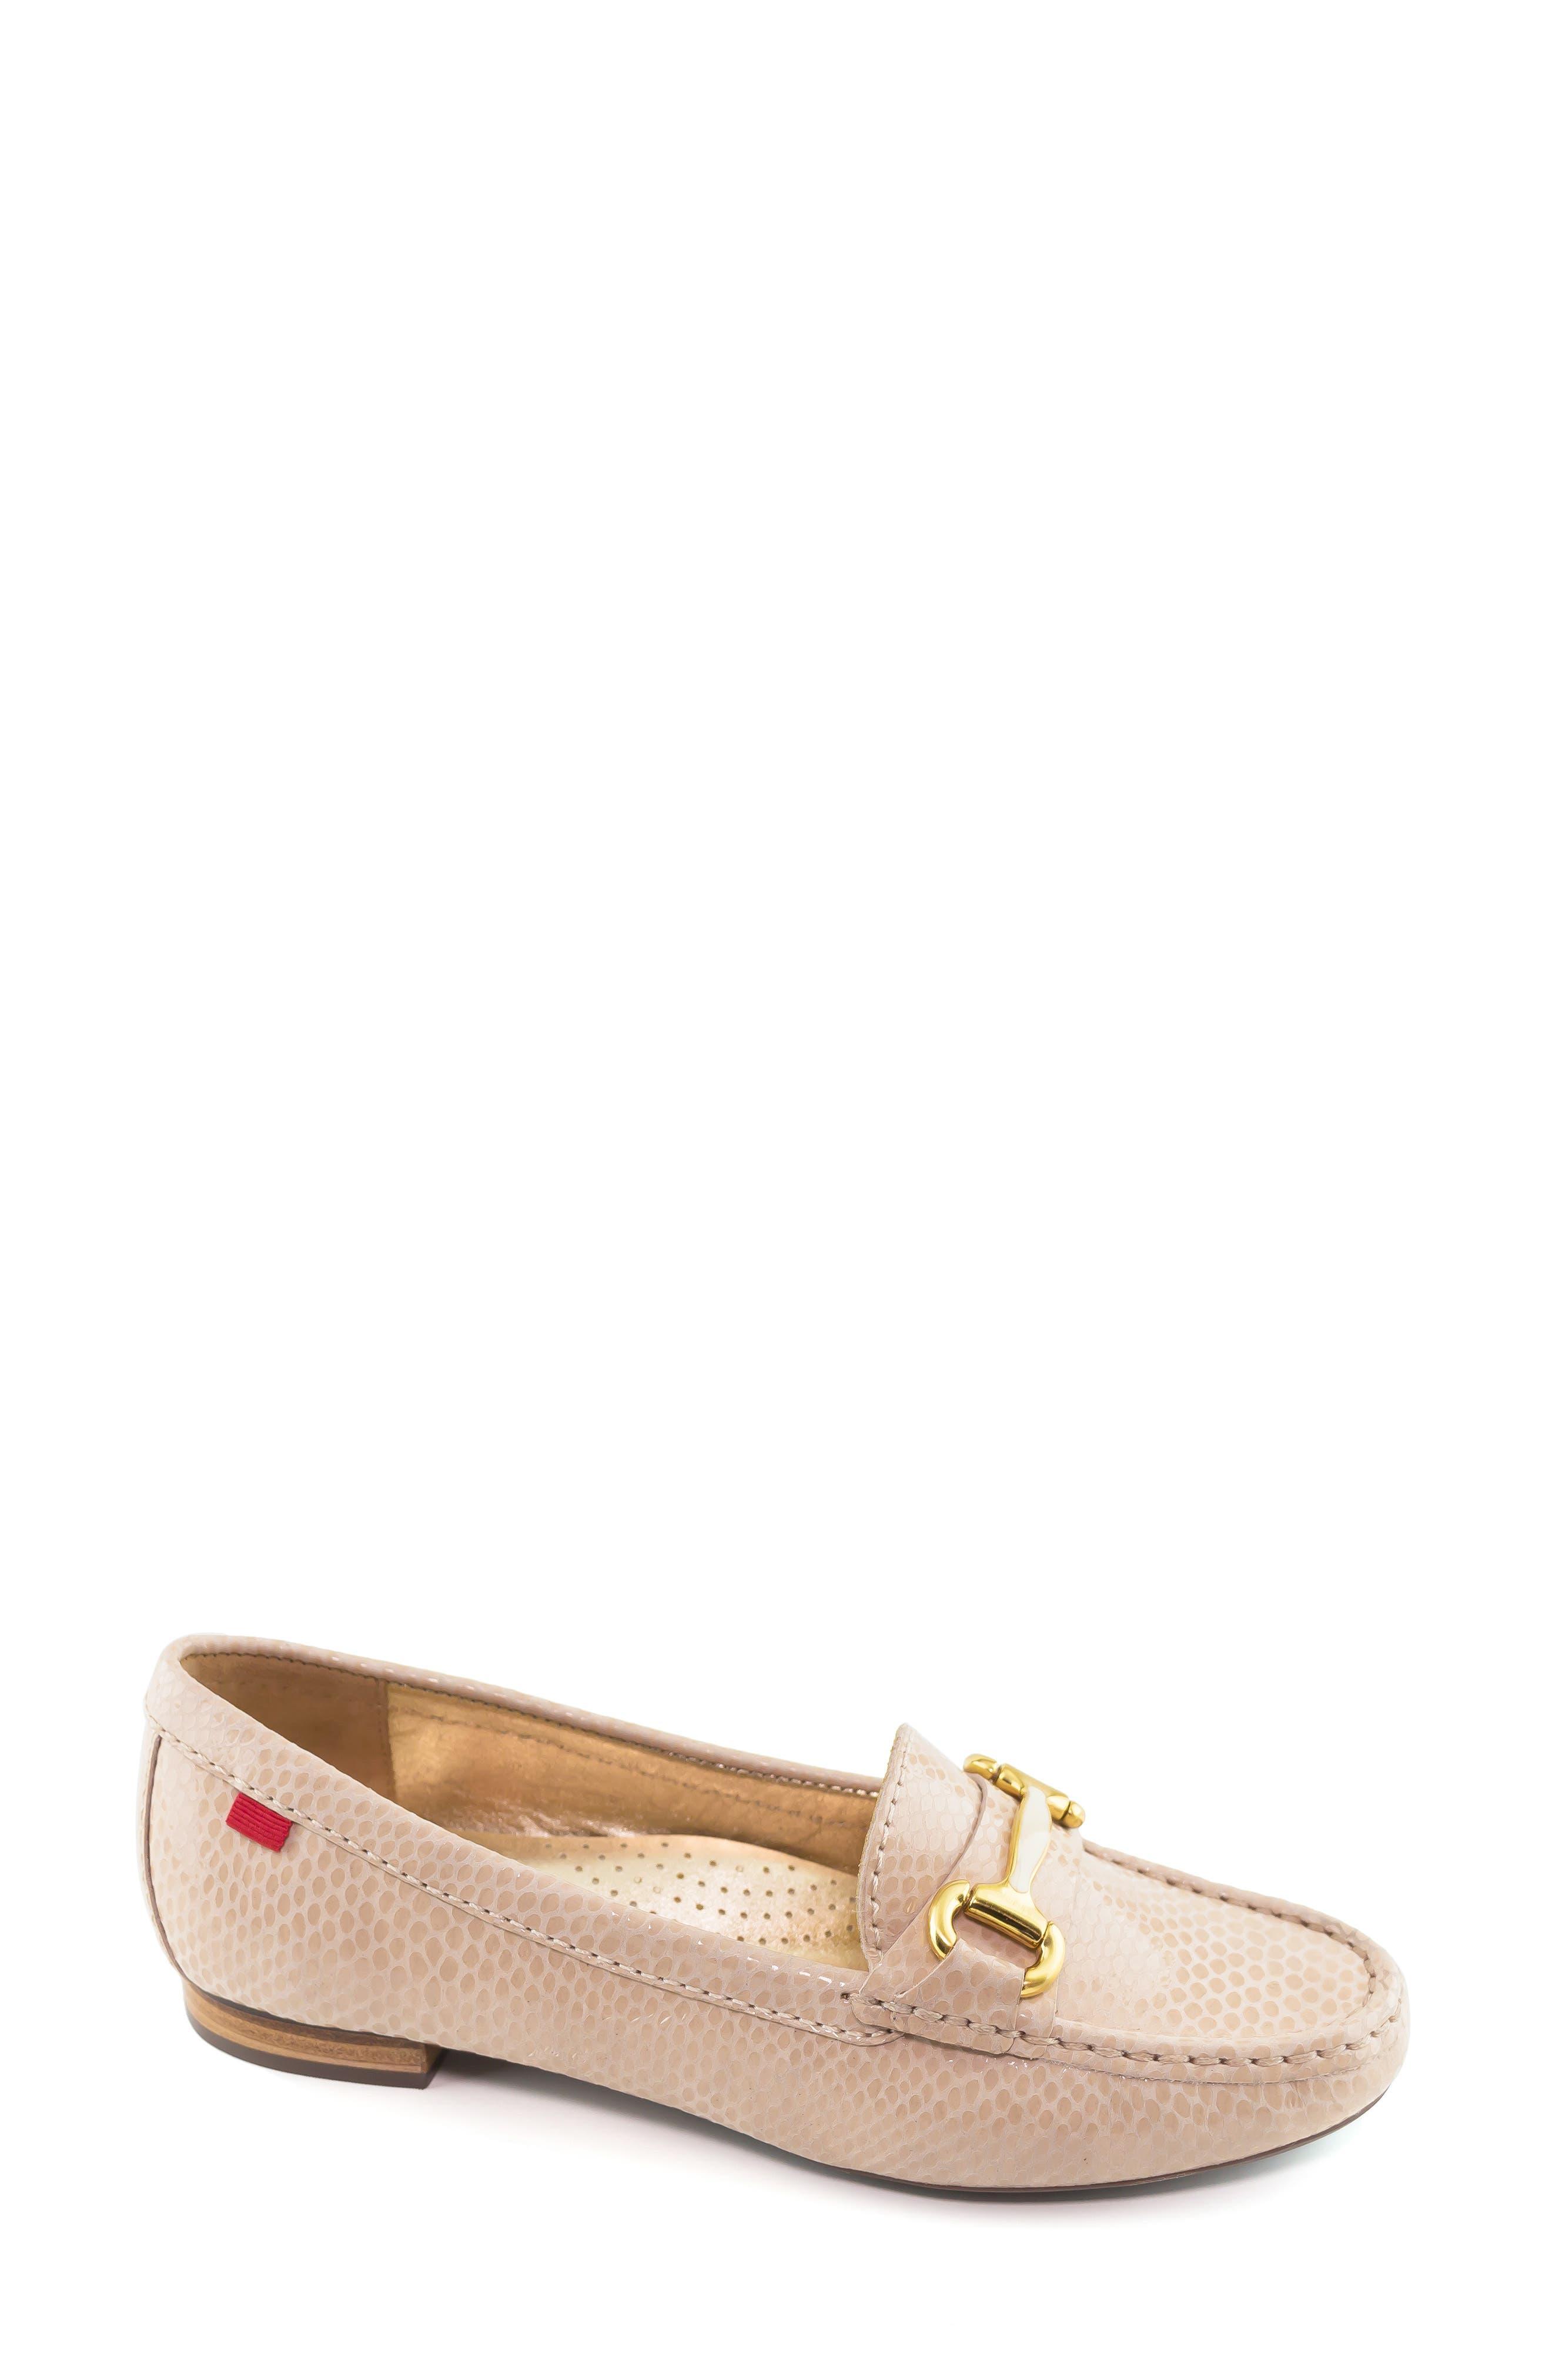 Marc Joseph New York Grand Street Loafer, Pink